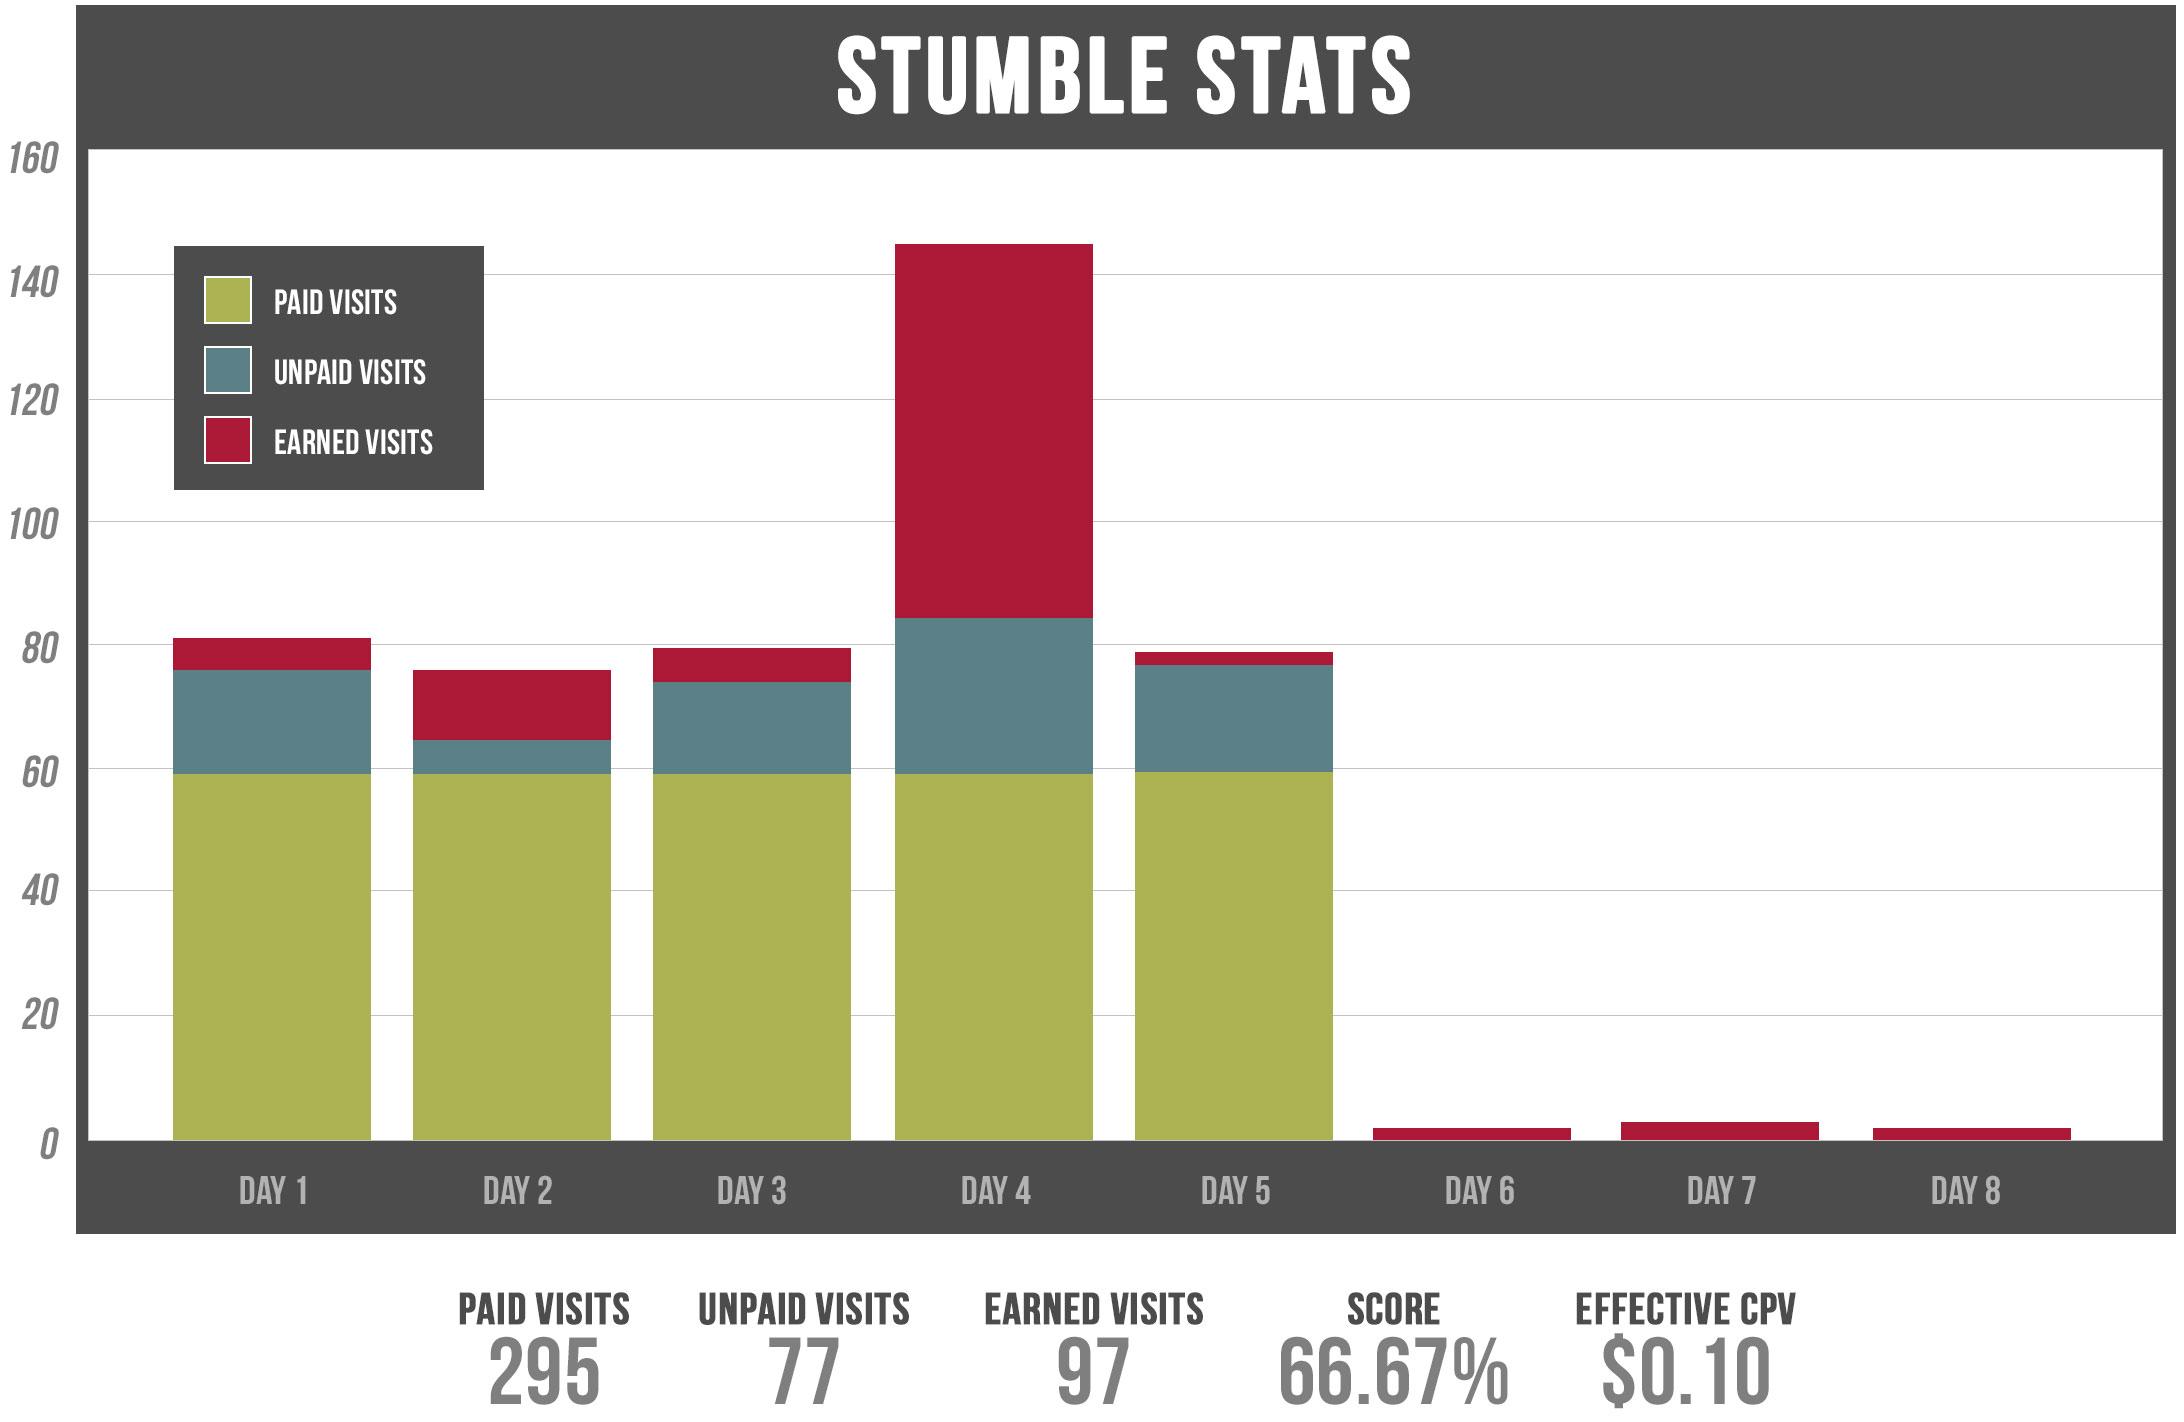 stumble-stats-1